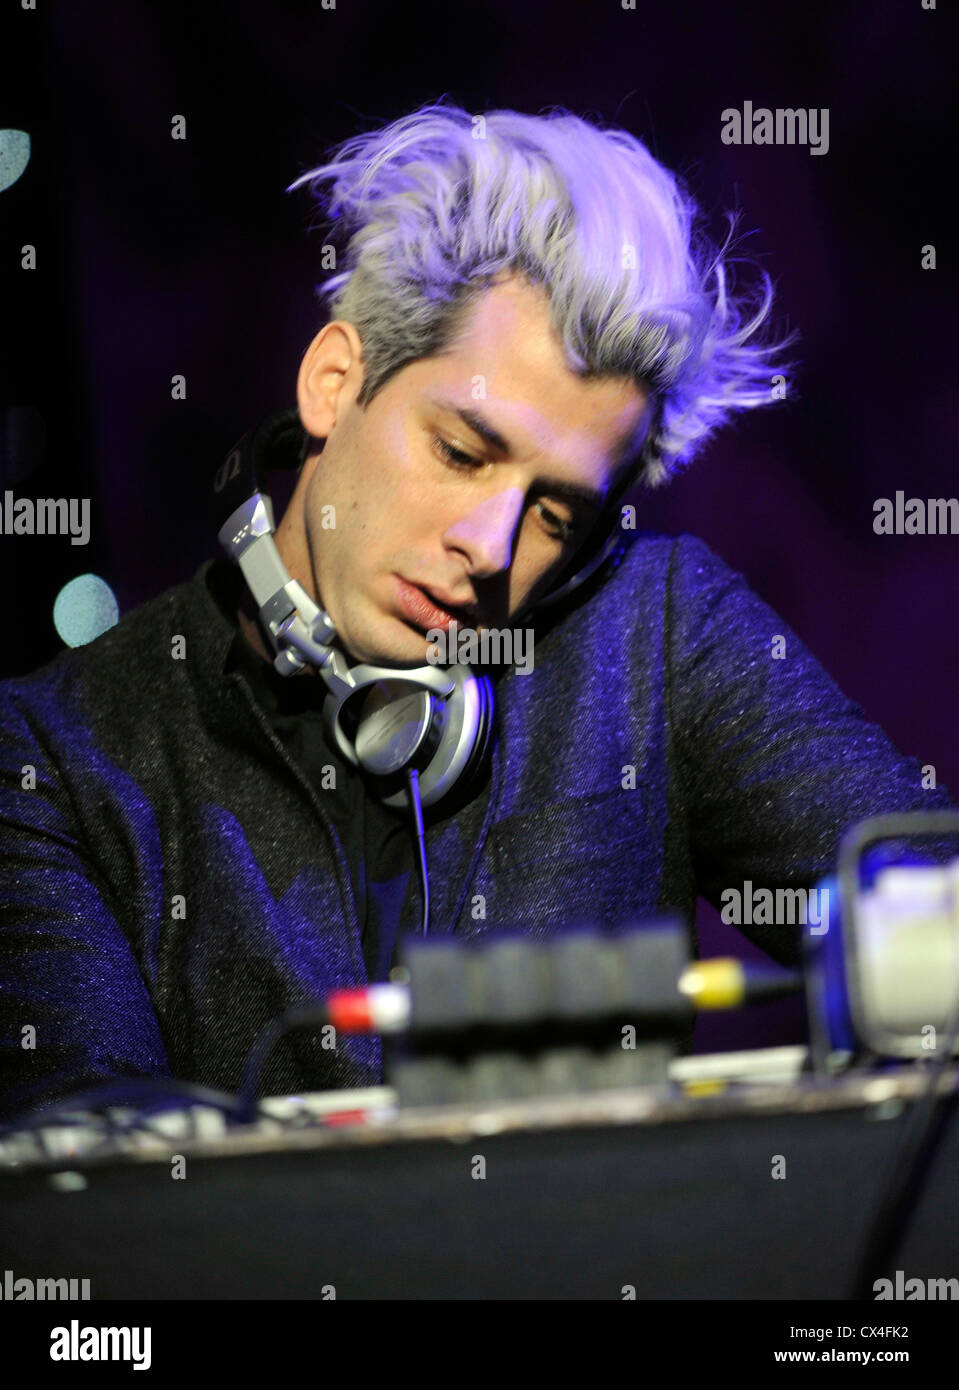 mark ronson at  BRMB Live 2010 at the Birmingham LG Arena in Birmingham, Englan - Stock Image